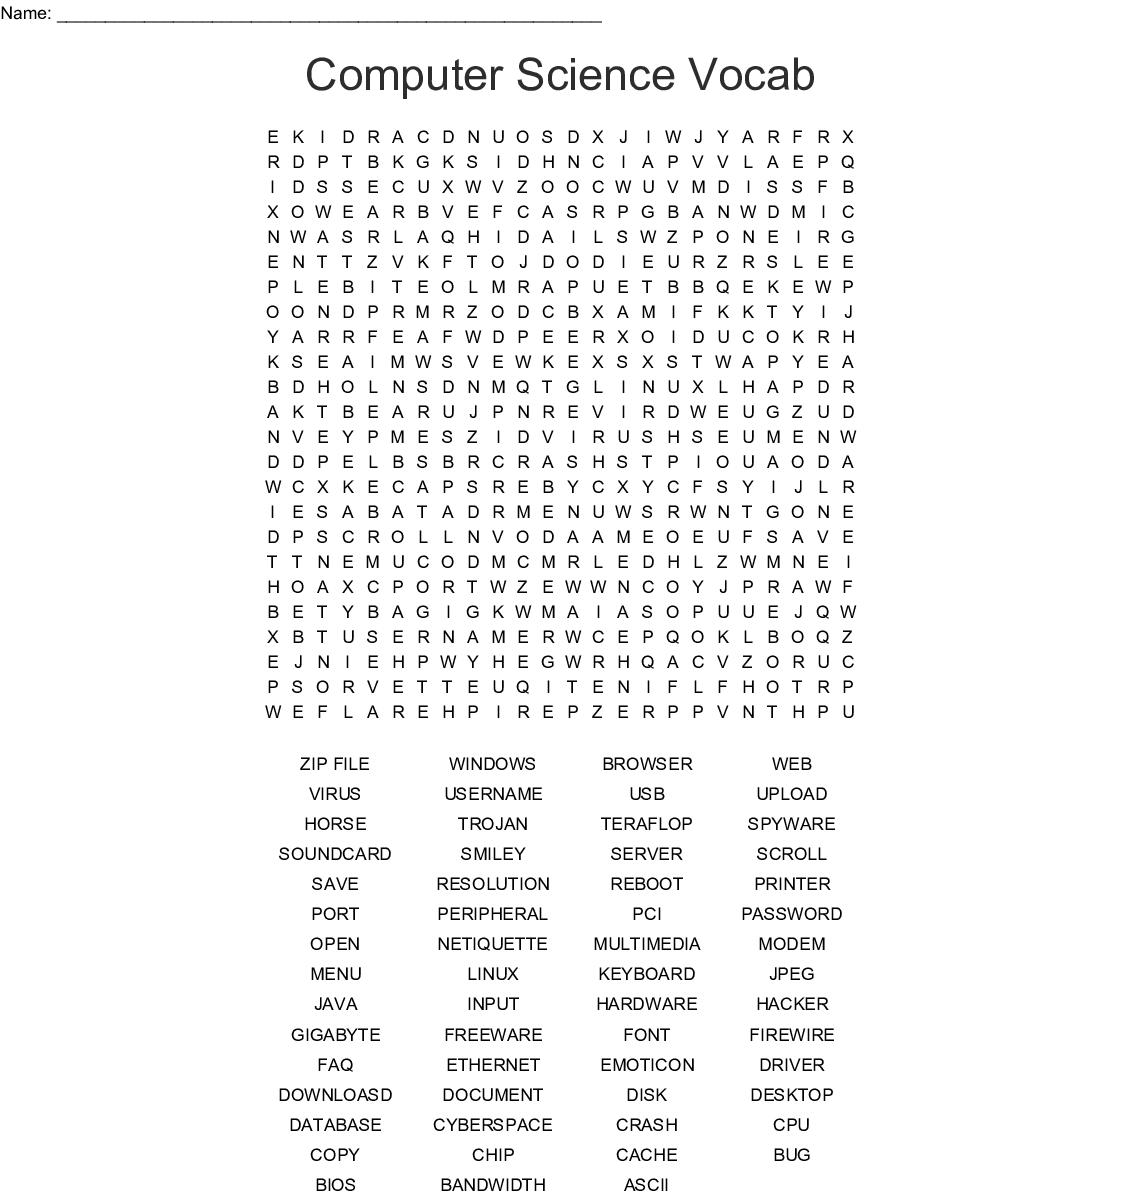 Computer Science Vocab Word Search - WordMint